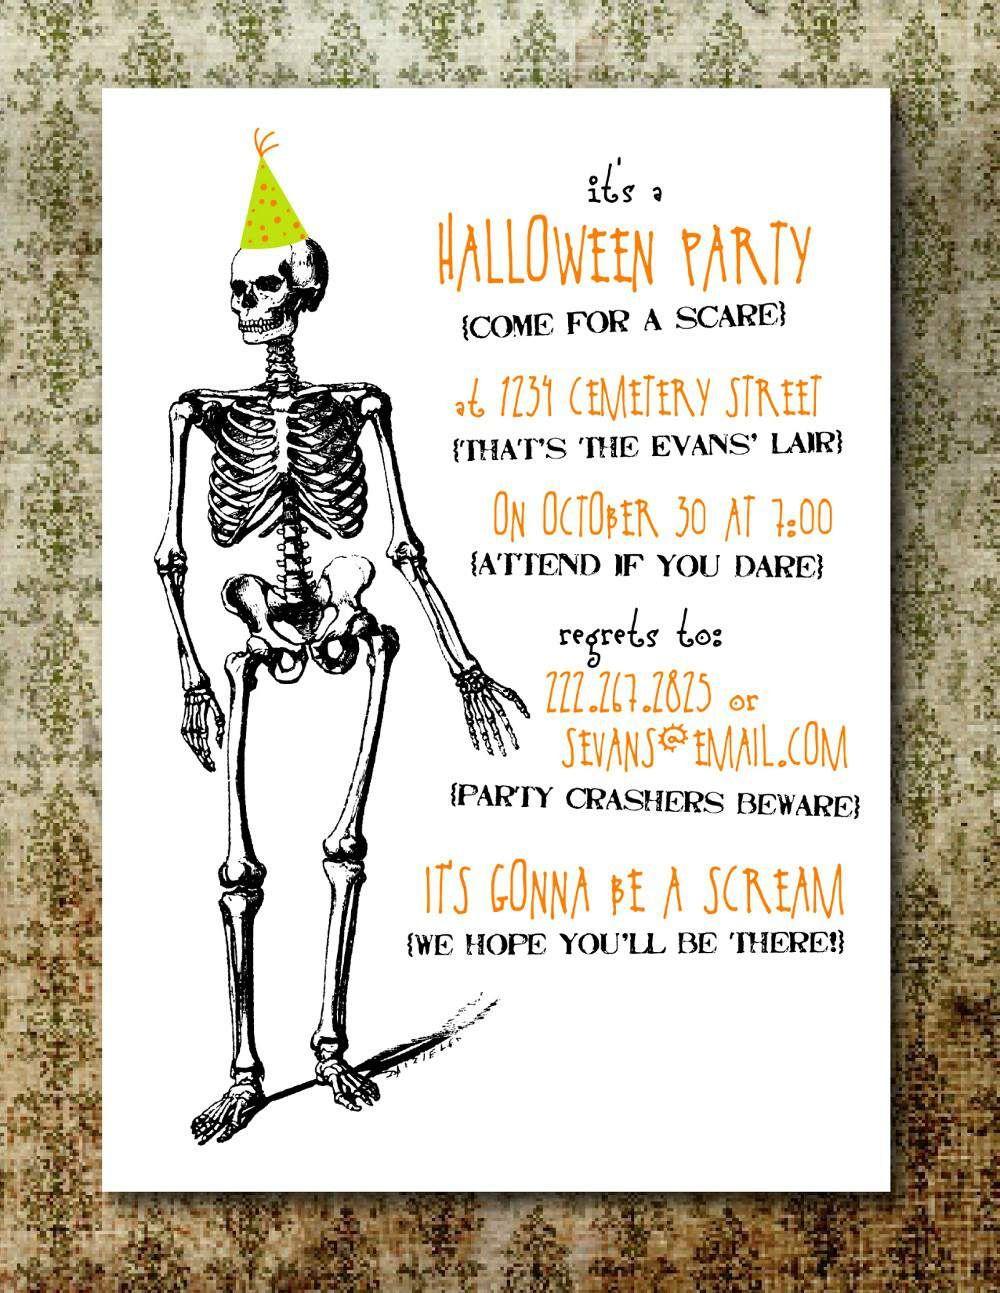 Free Printable Halloween Invitation Templates | Free Printable - Halloween Party Invitation Templates Free Printable